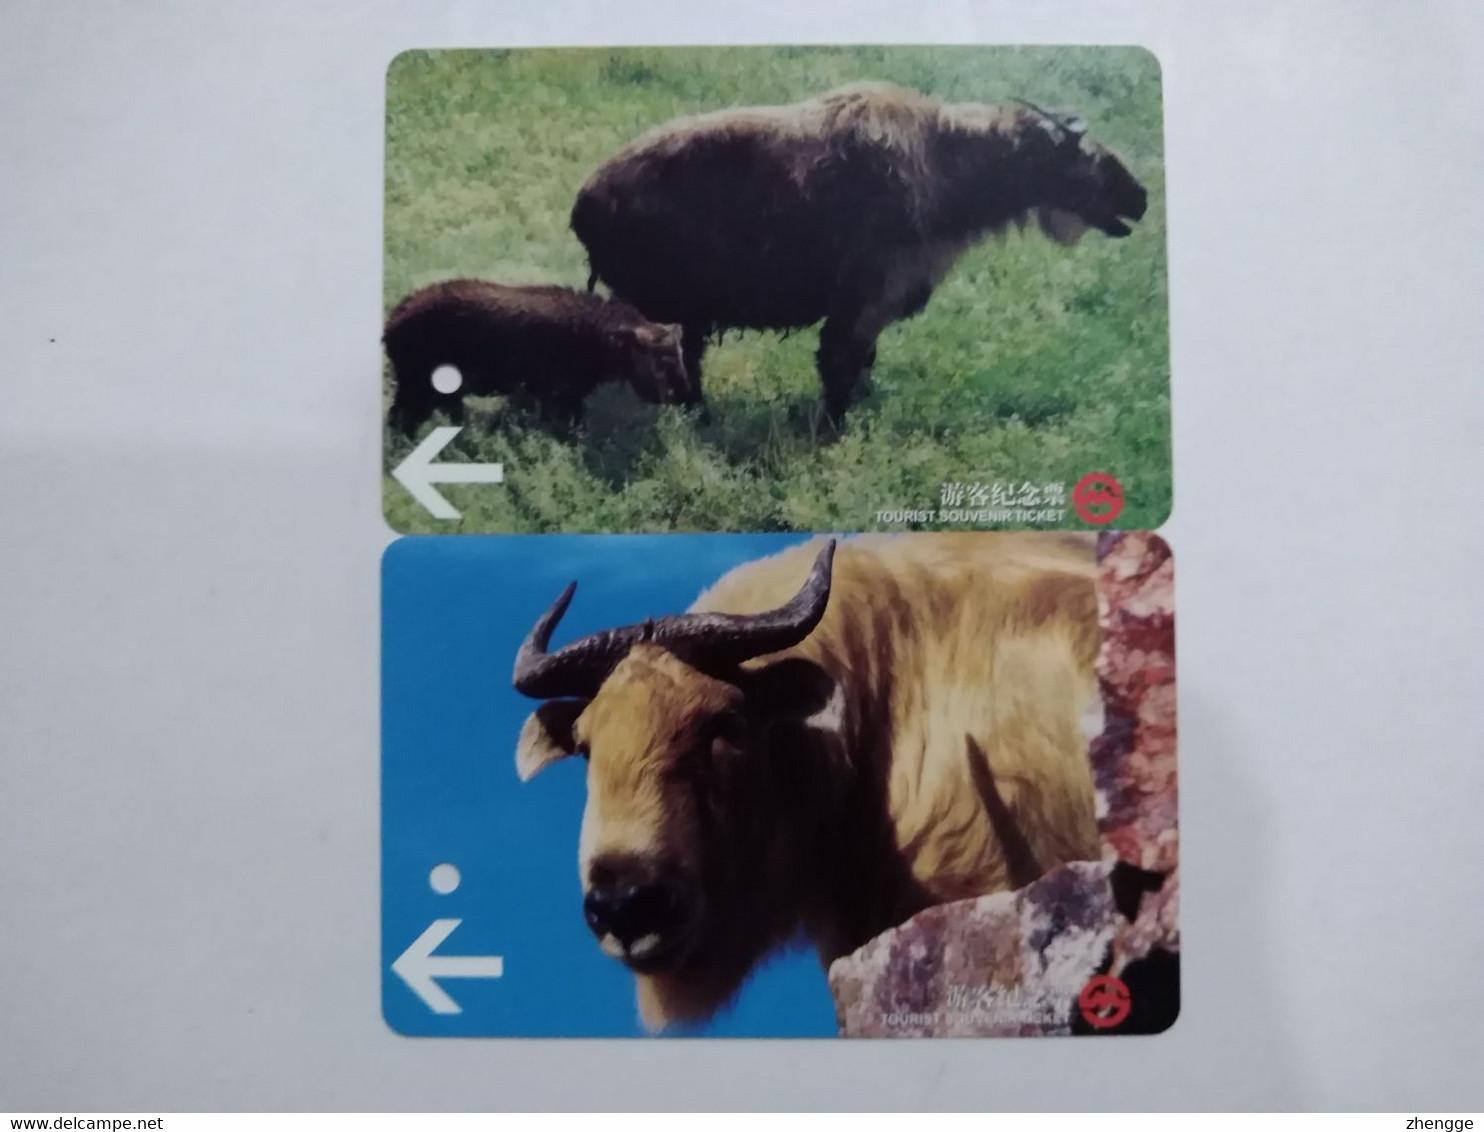 China Transport Cards, Budorcas Taxicolor Bedfordi, Metro Card, Shanghai City, (2pcs) - Unclassified